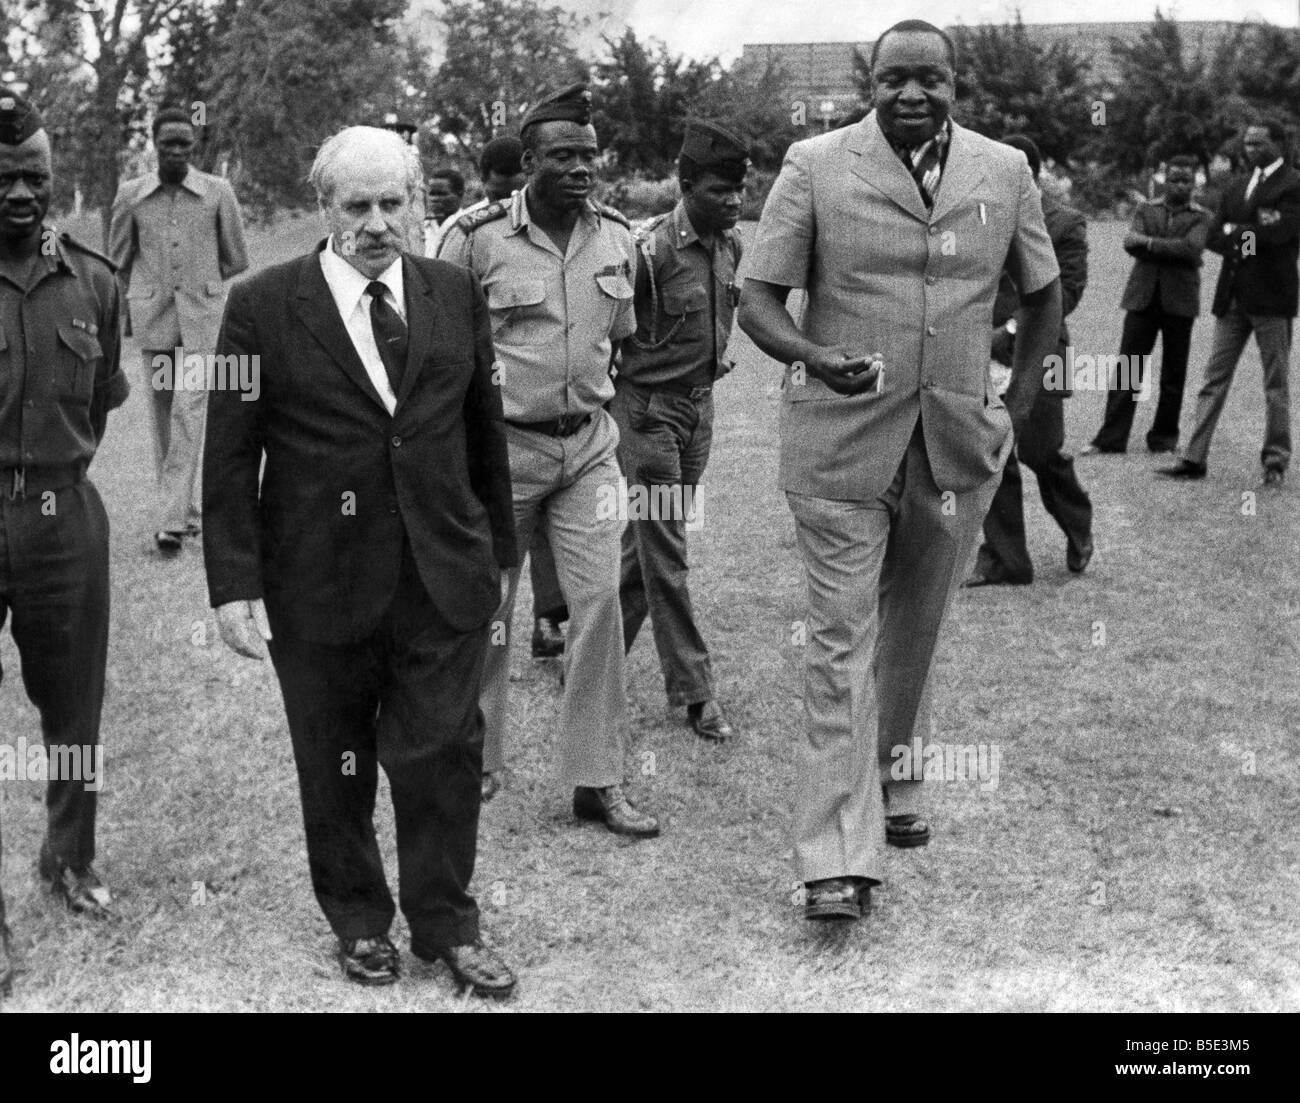 General Idi Amin of Uganda with his associate Bob Astles, a former ...